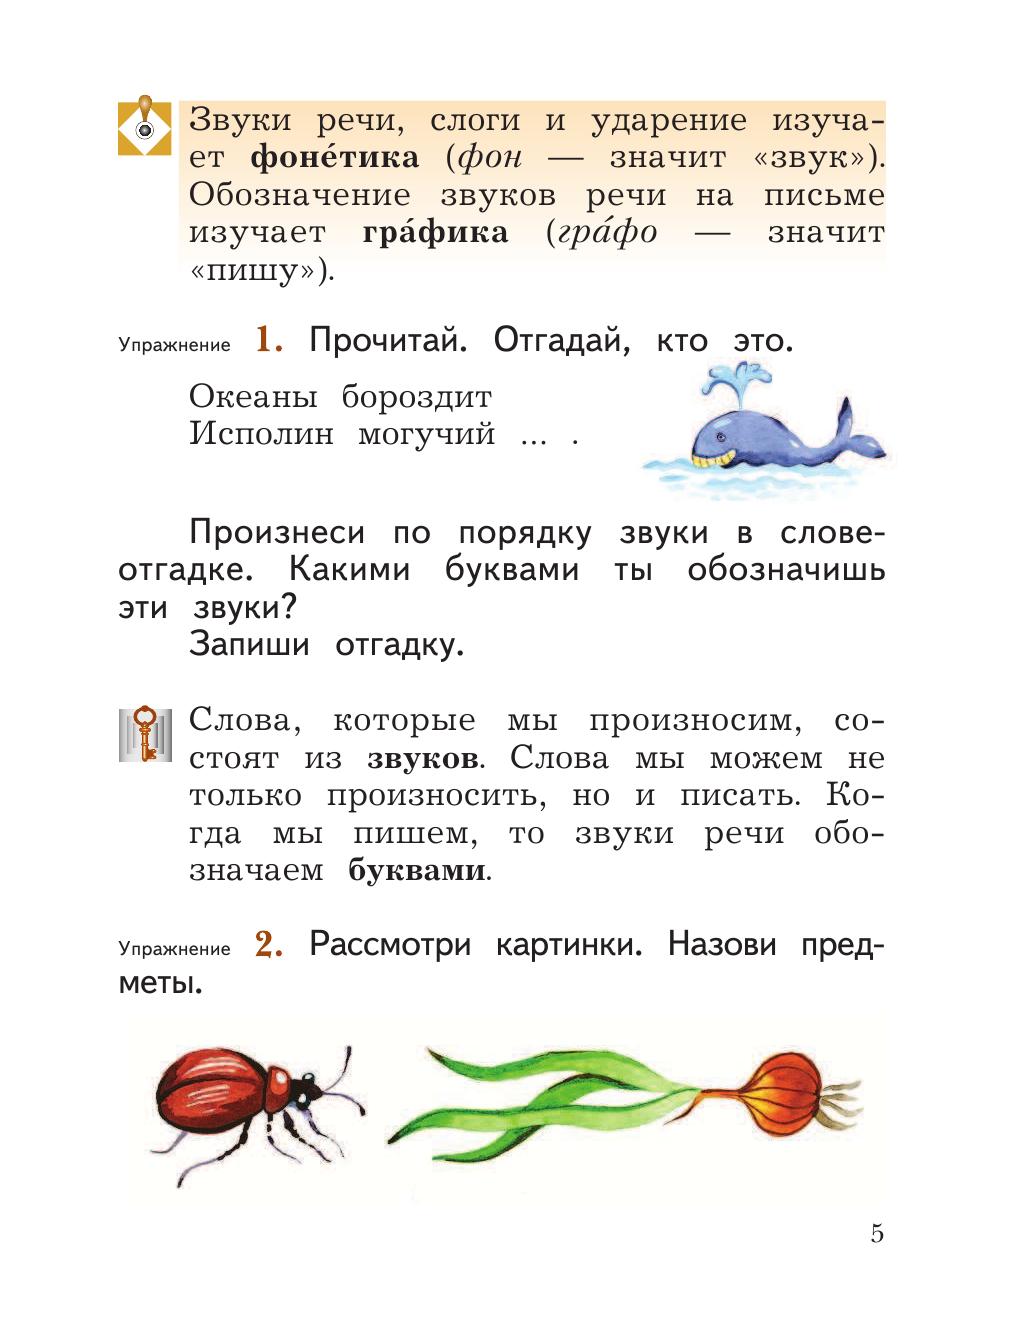 Решебник По Русскому 3 Класс Иванов Евдокимова Кузнецова Петленко Романова